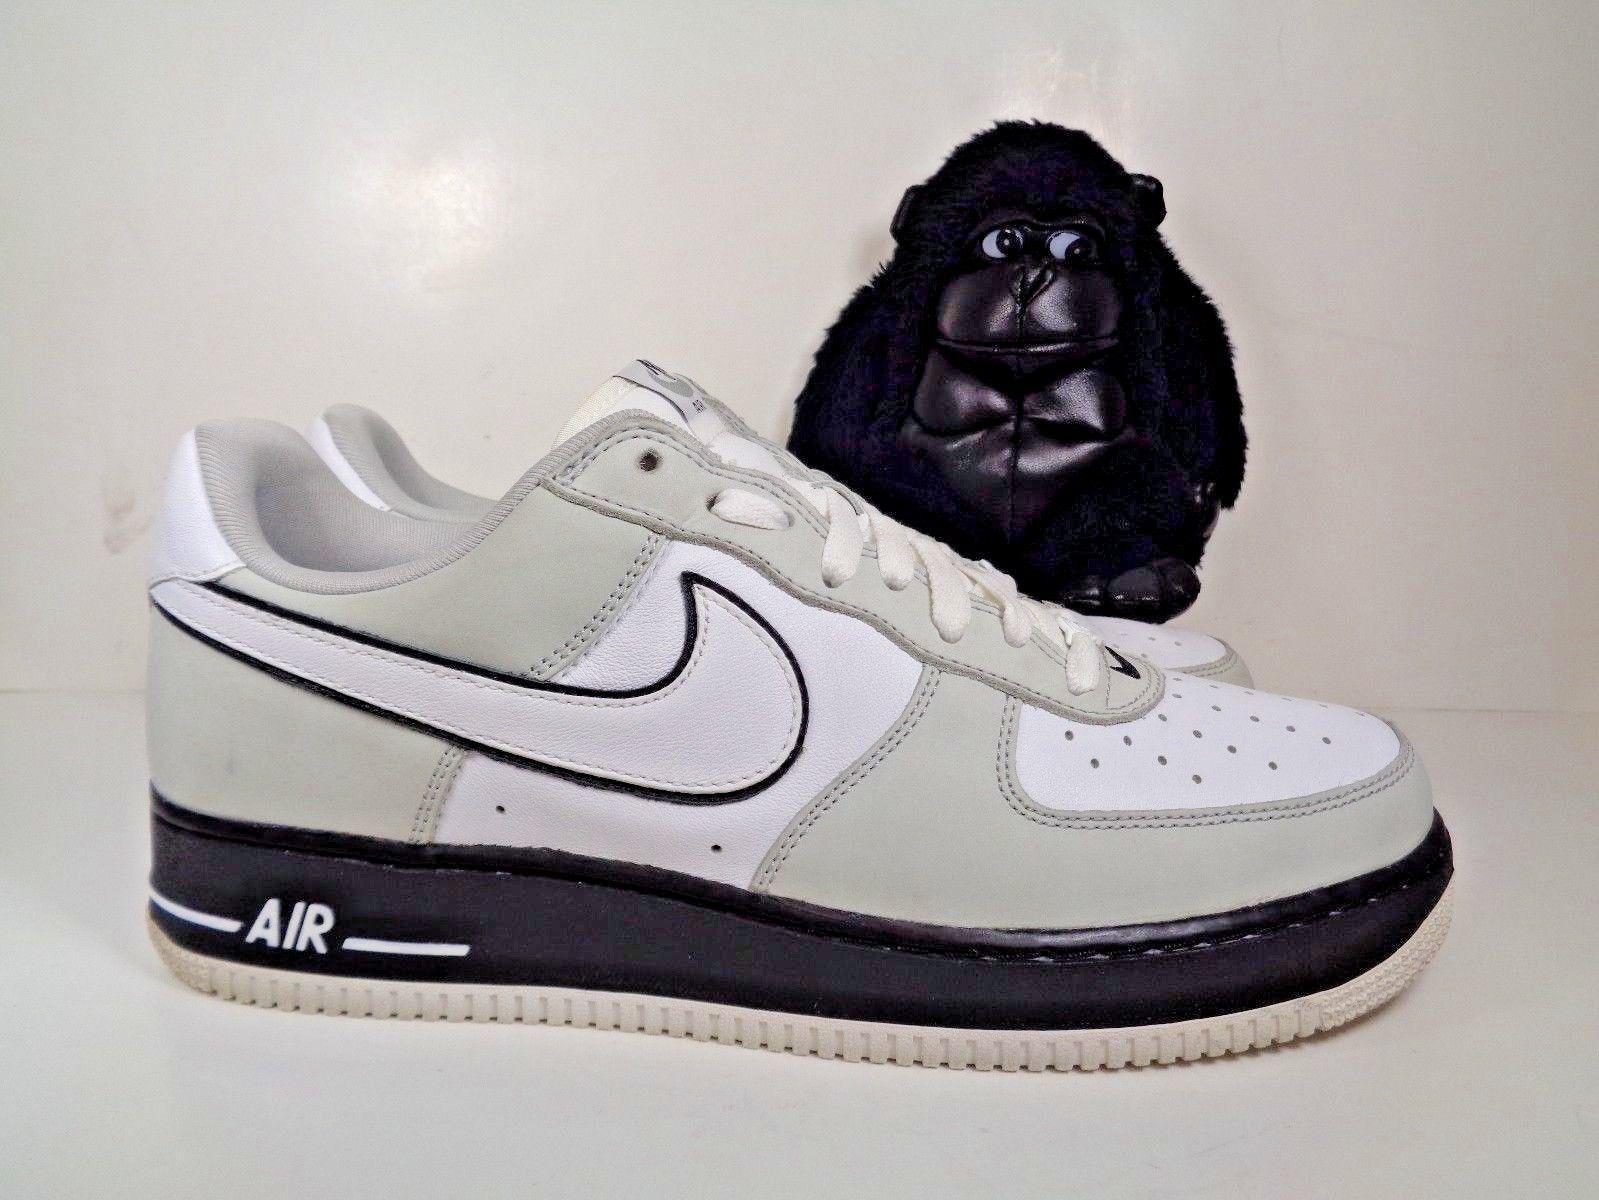 7f3ec401af Mens Nike Air Force 1 Neutral shoes size 11 US 2005 Grey 306353-912 ...